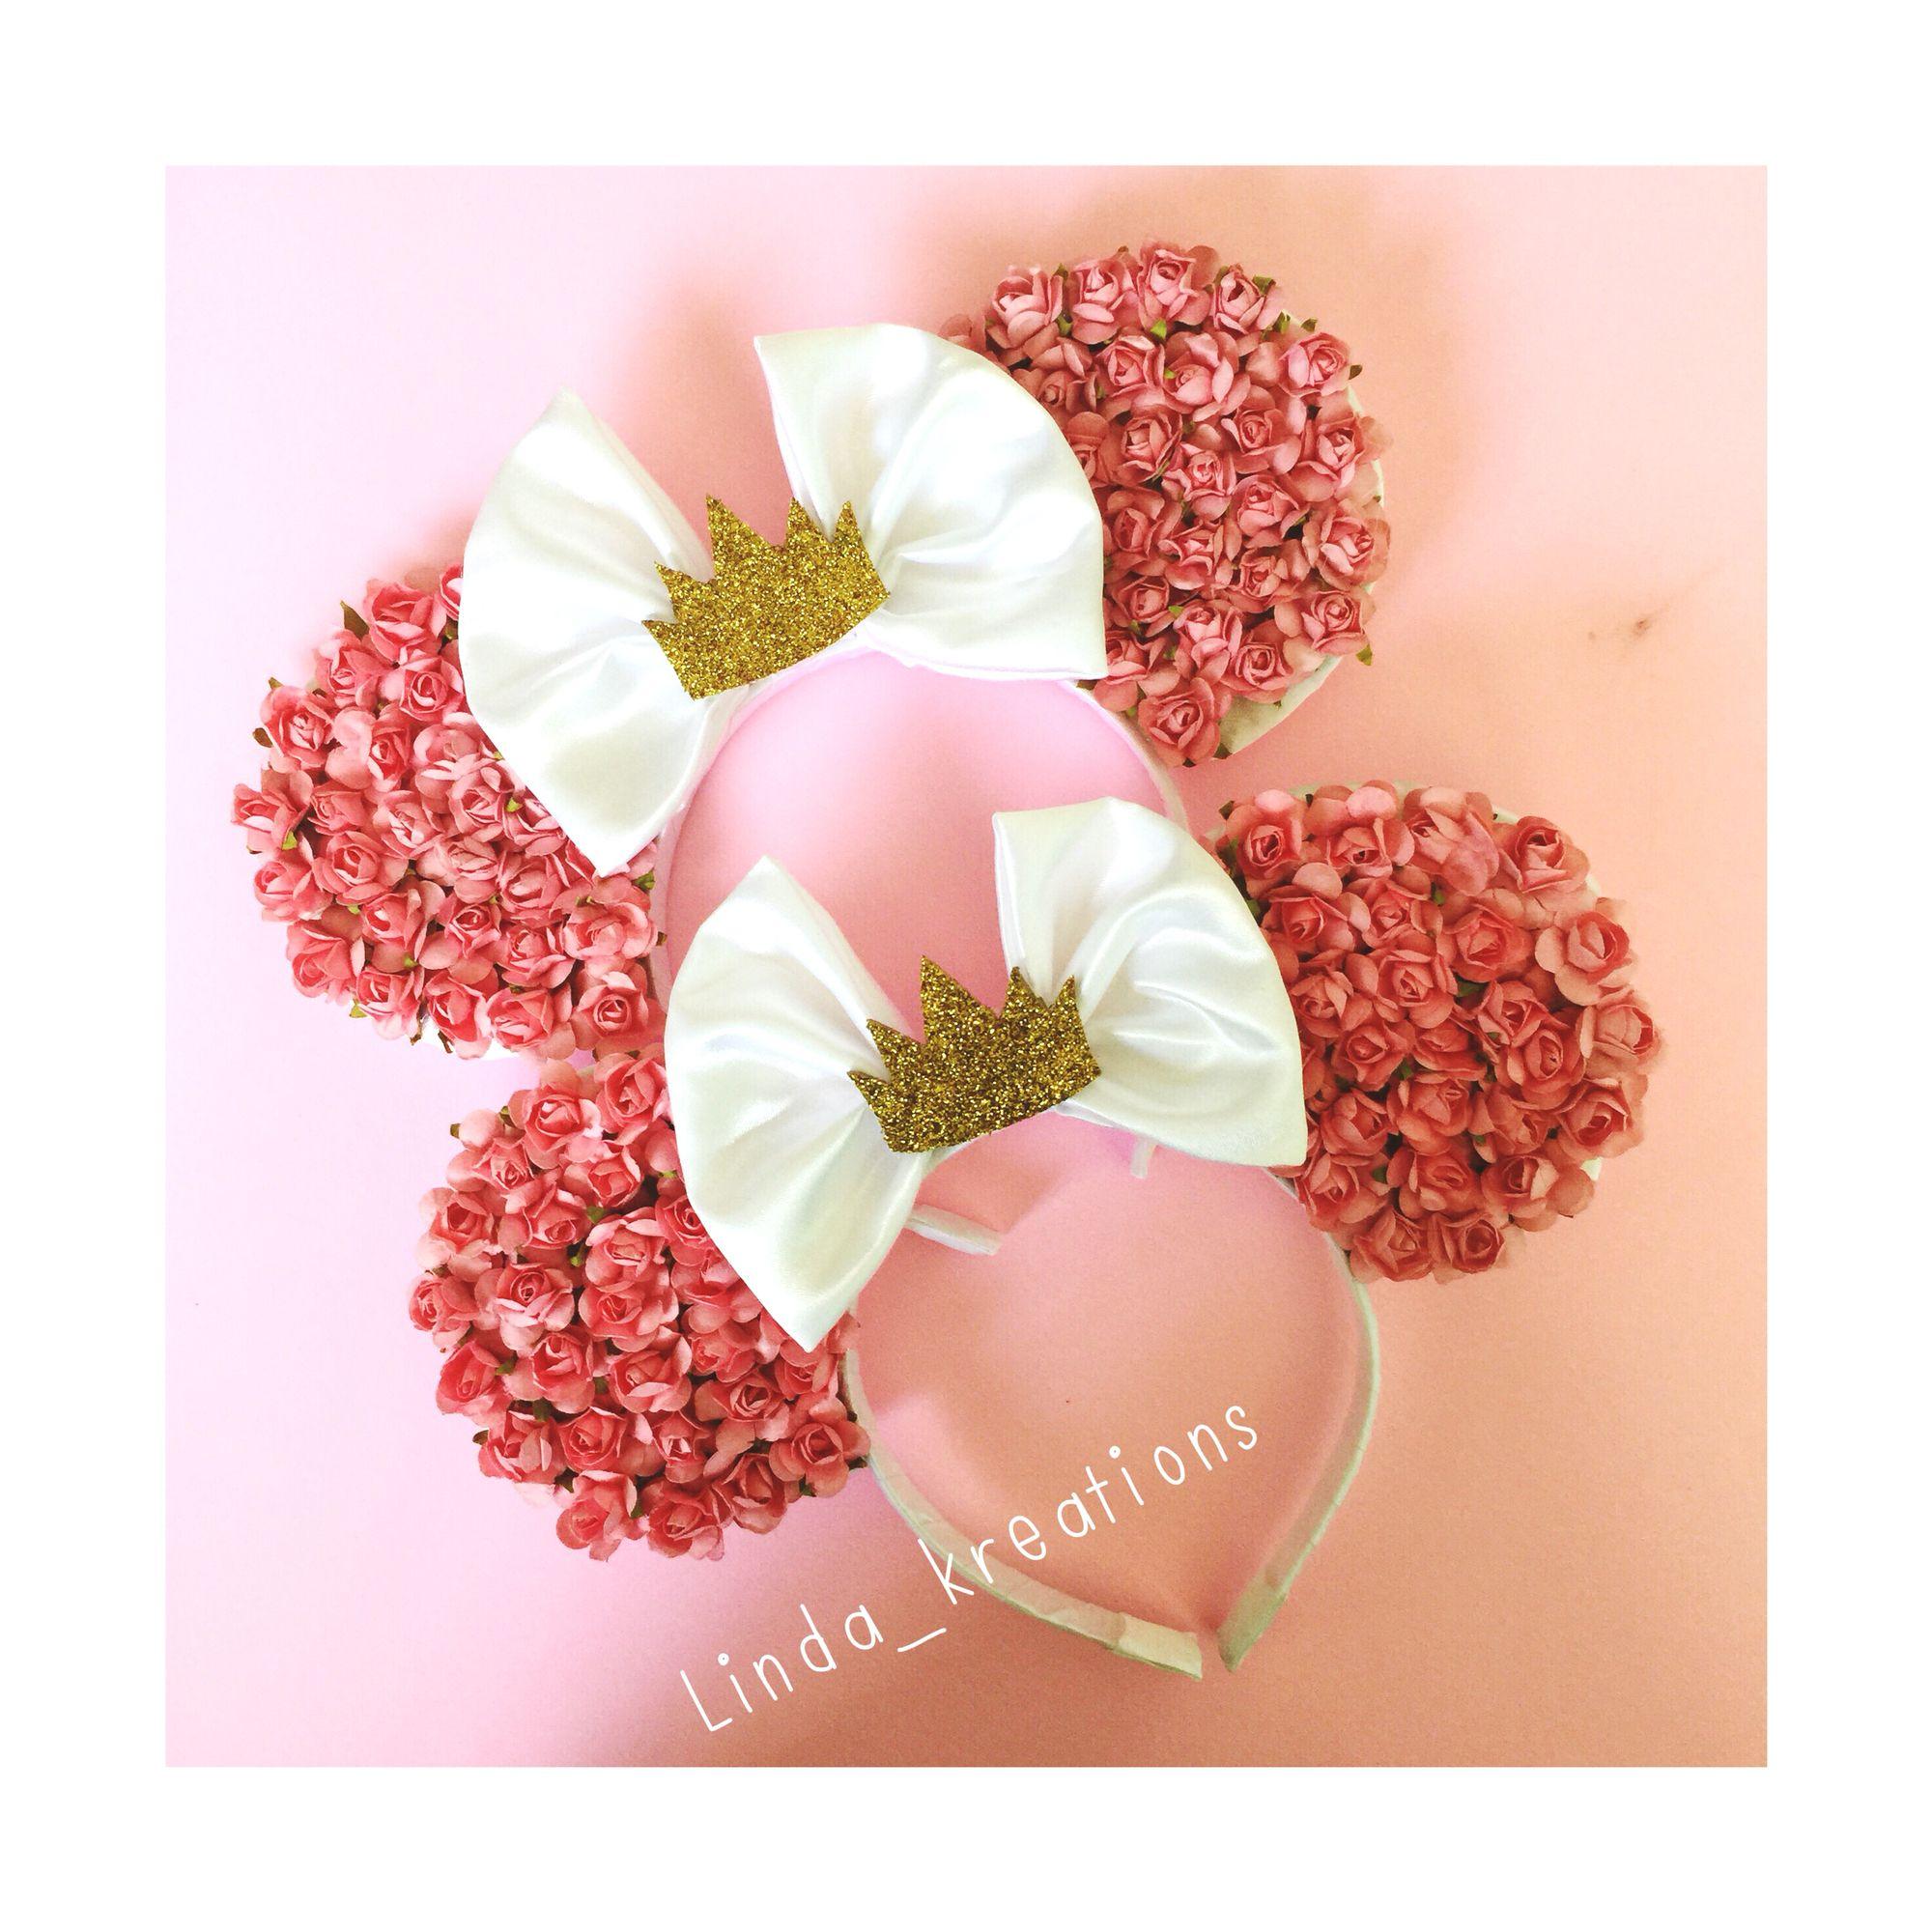 Floral princess #etsyshop  #lindakreations mouse ears